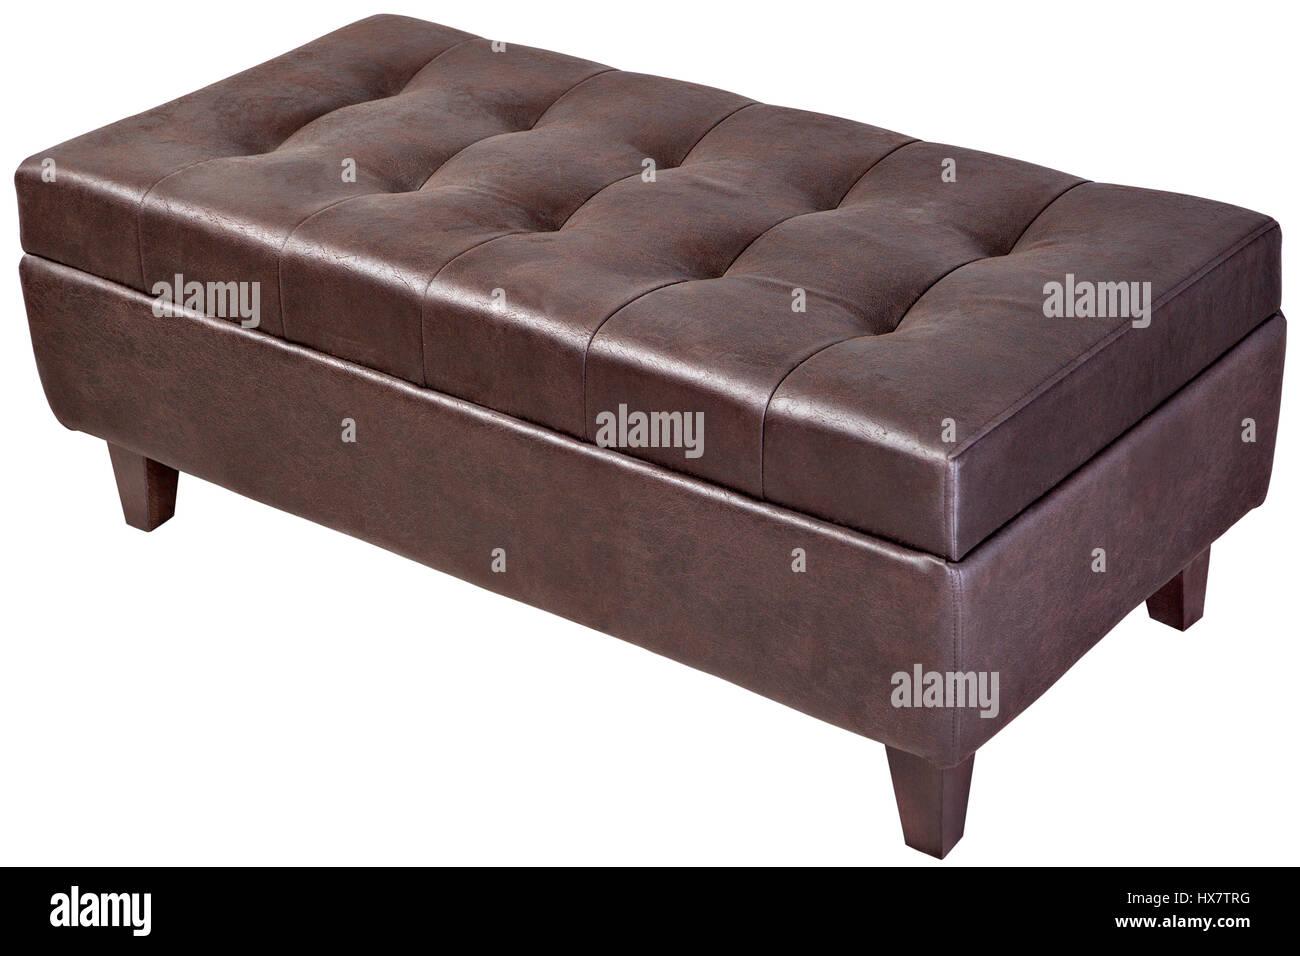 ersatzbank stockfotos ersatzbank bilder alamy. Black Bedroom Furniture Sets. Home Design Ideas